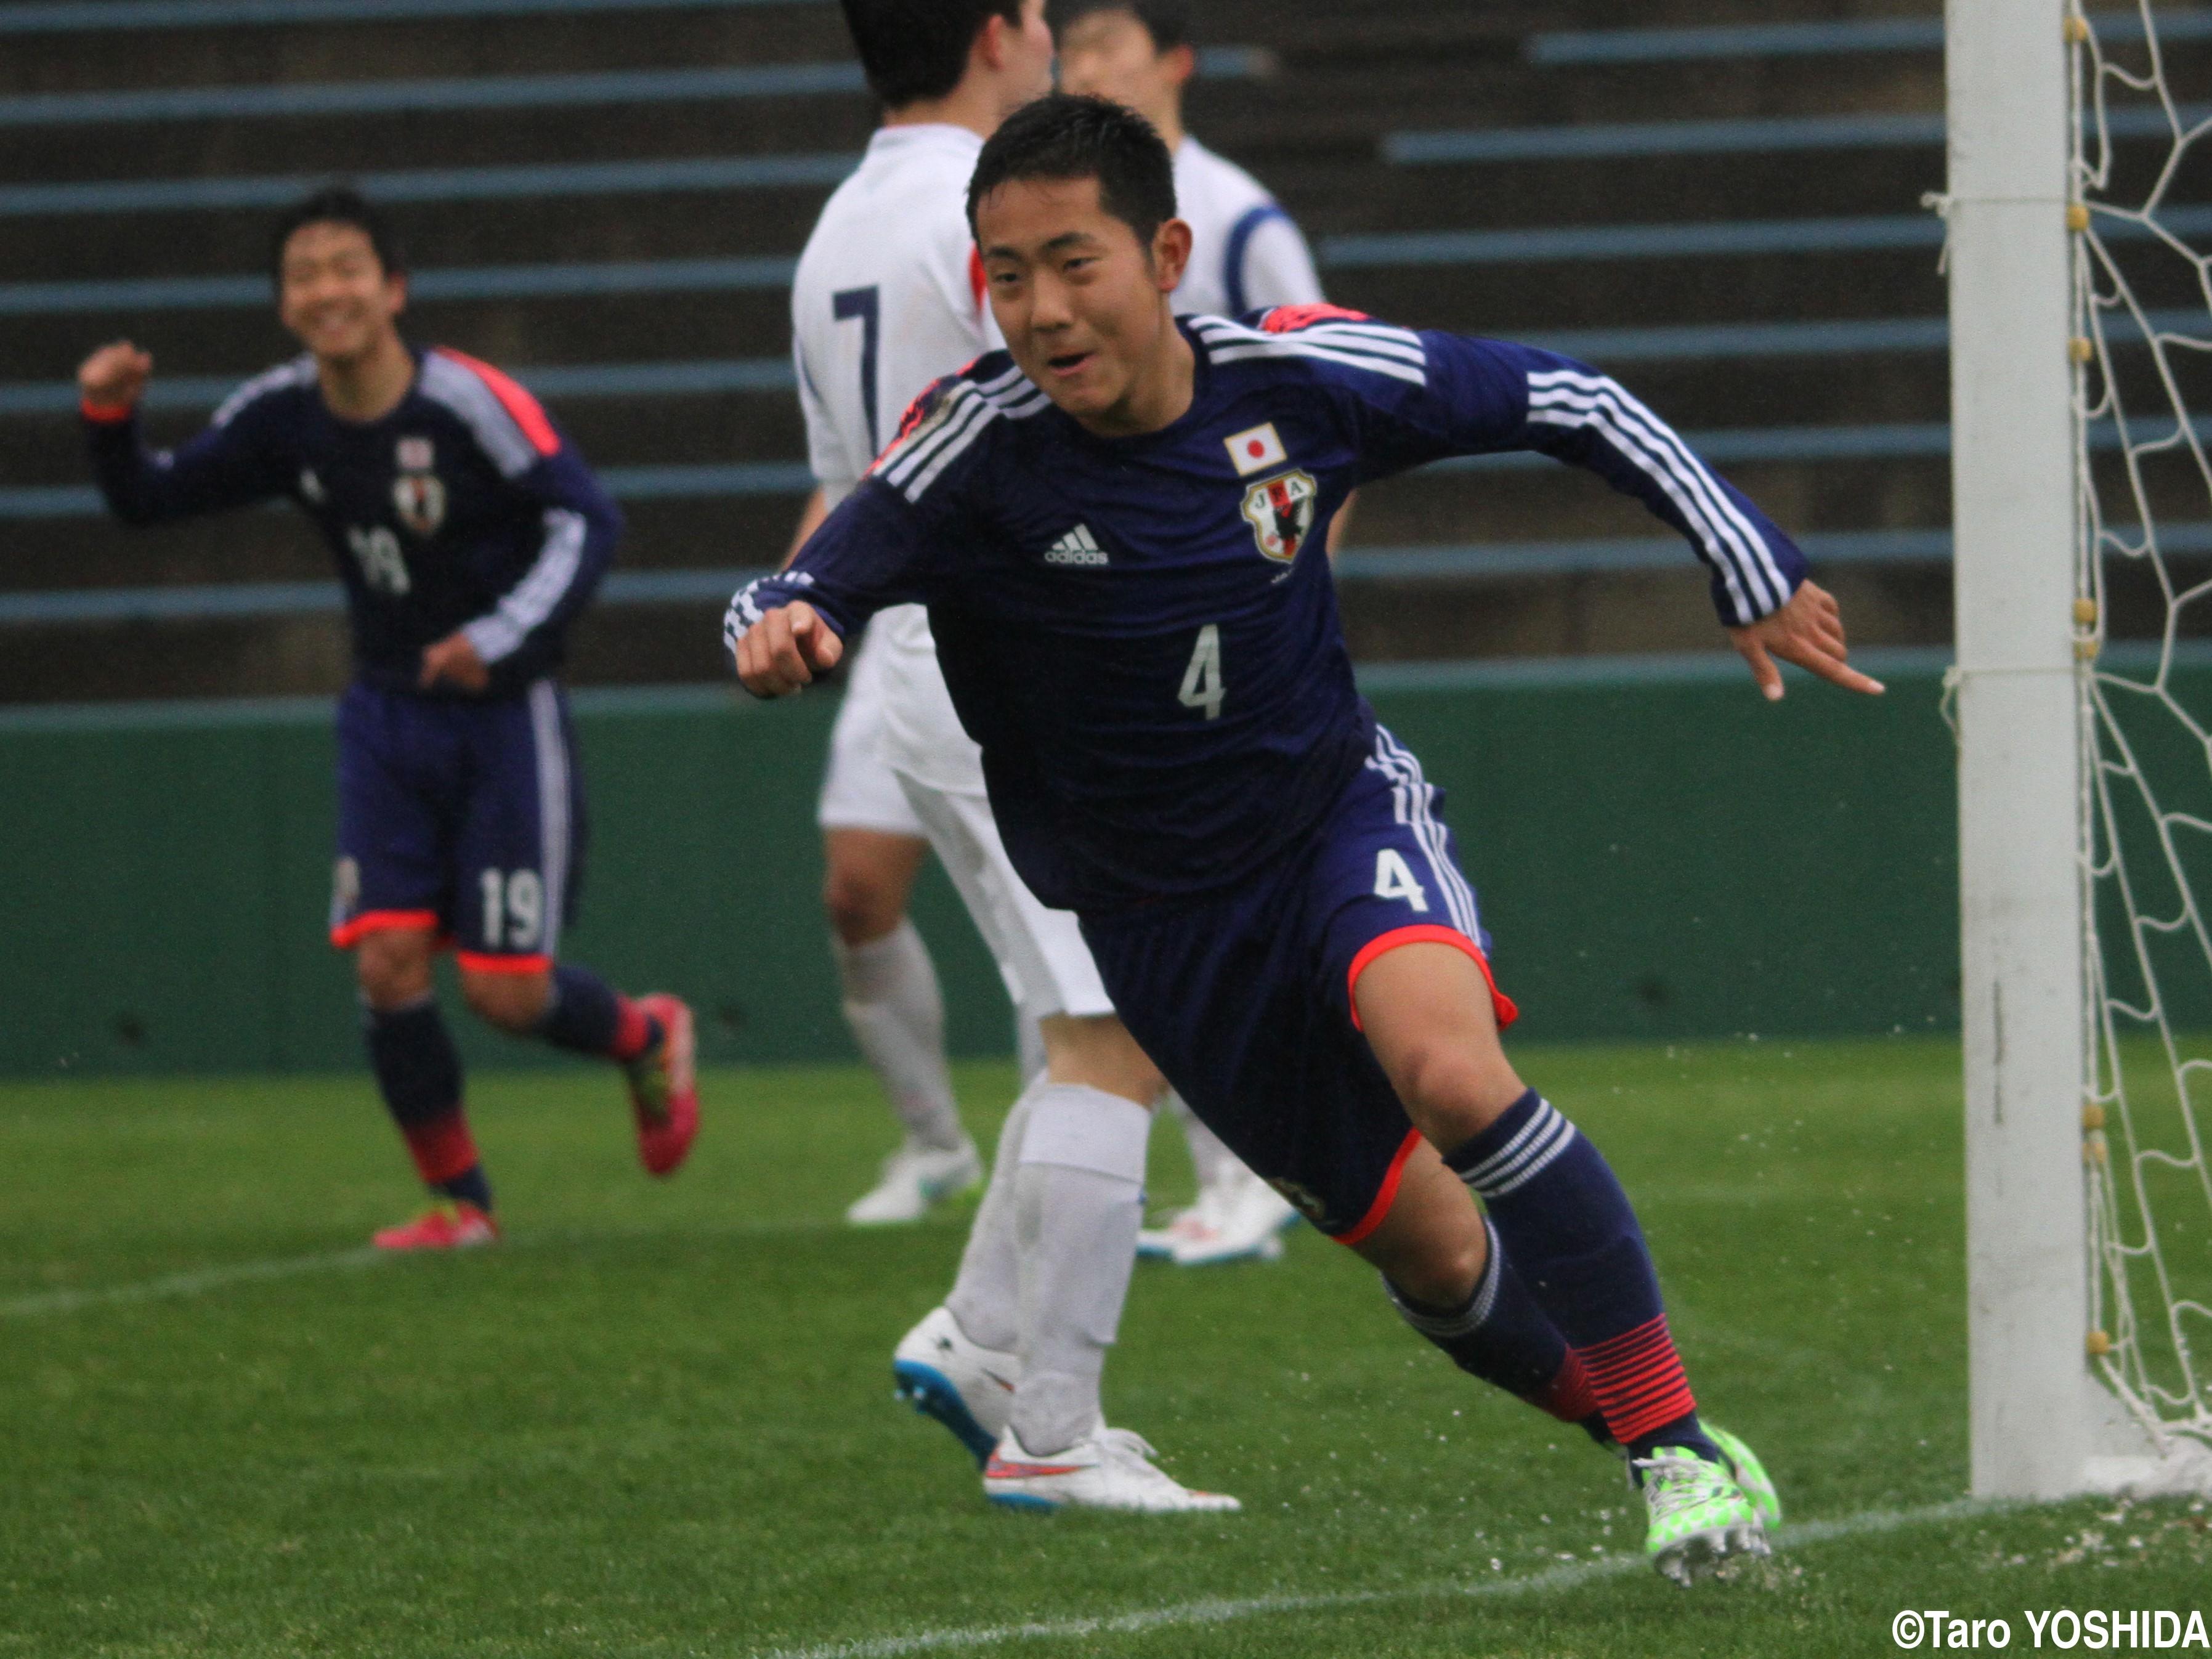 U-17日本代表は163cmの技巧派MF渡辺皓太が韓国から先制ヘッド(4枚)